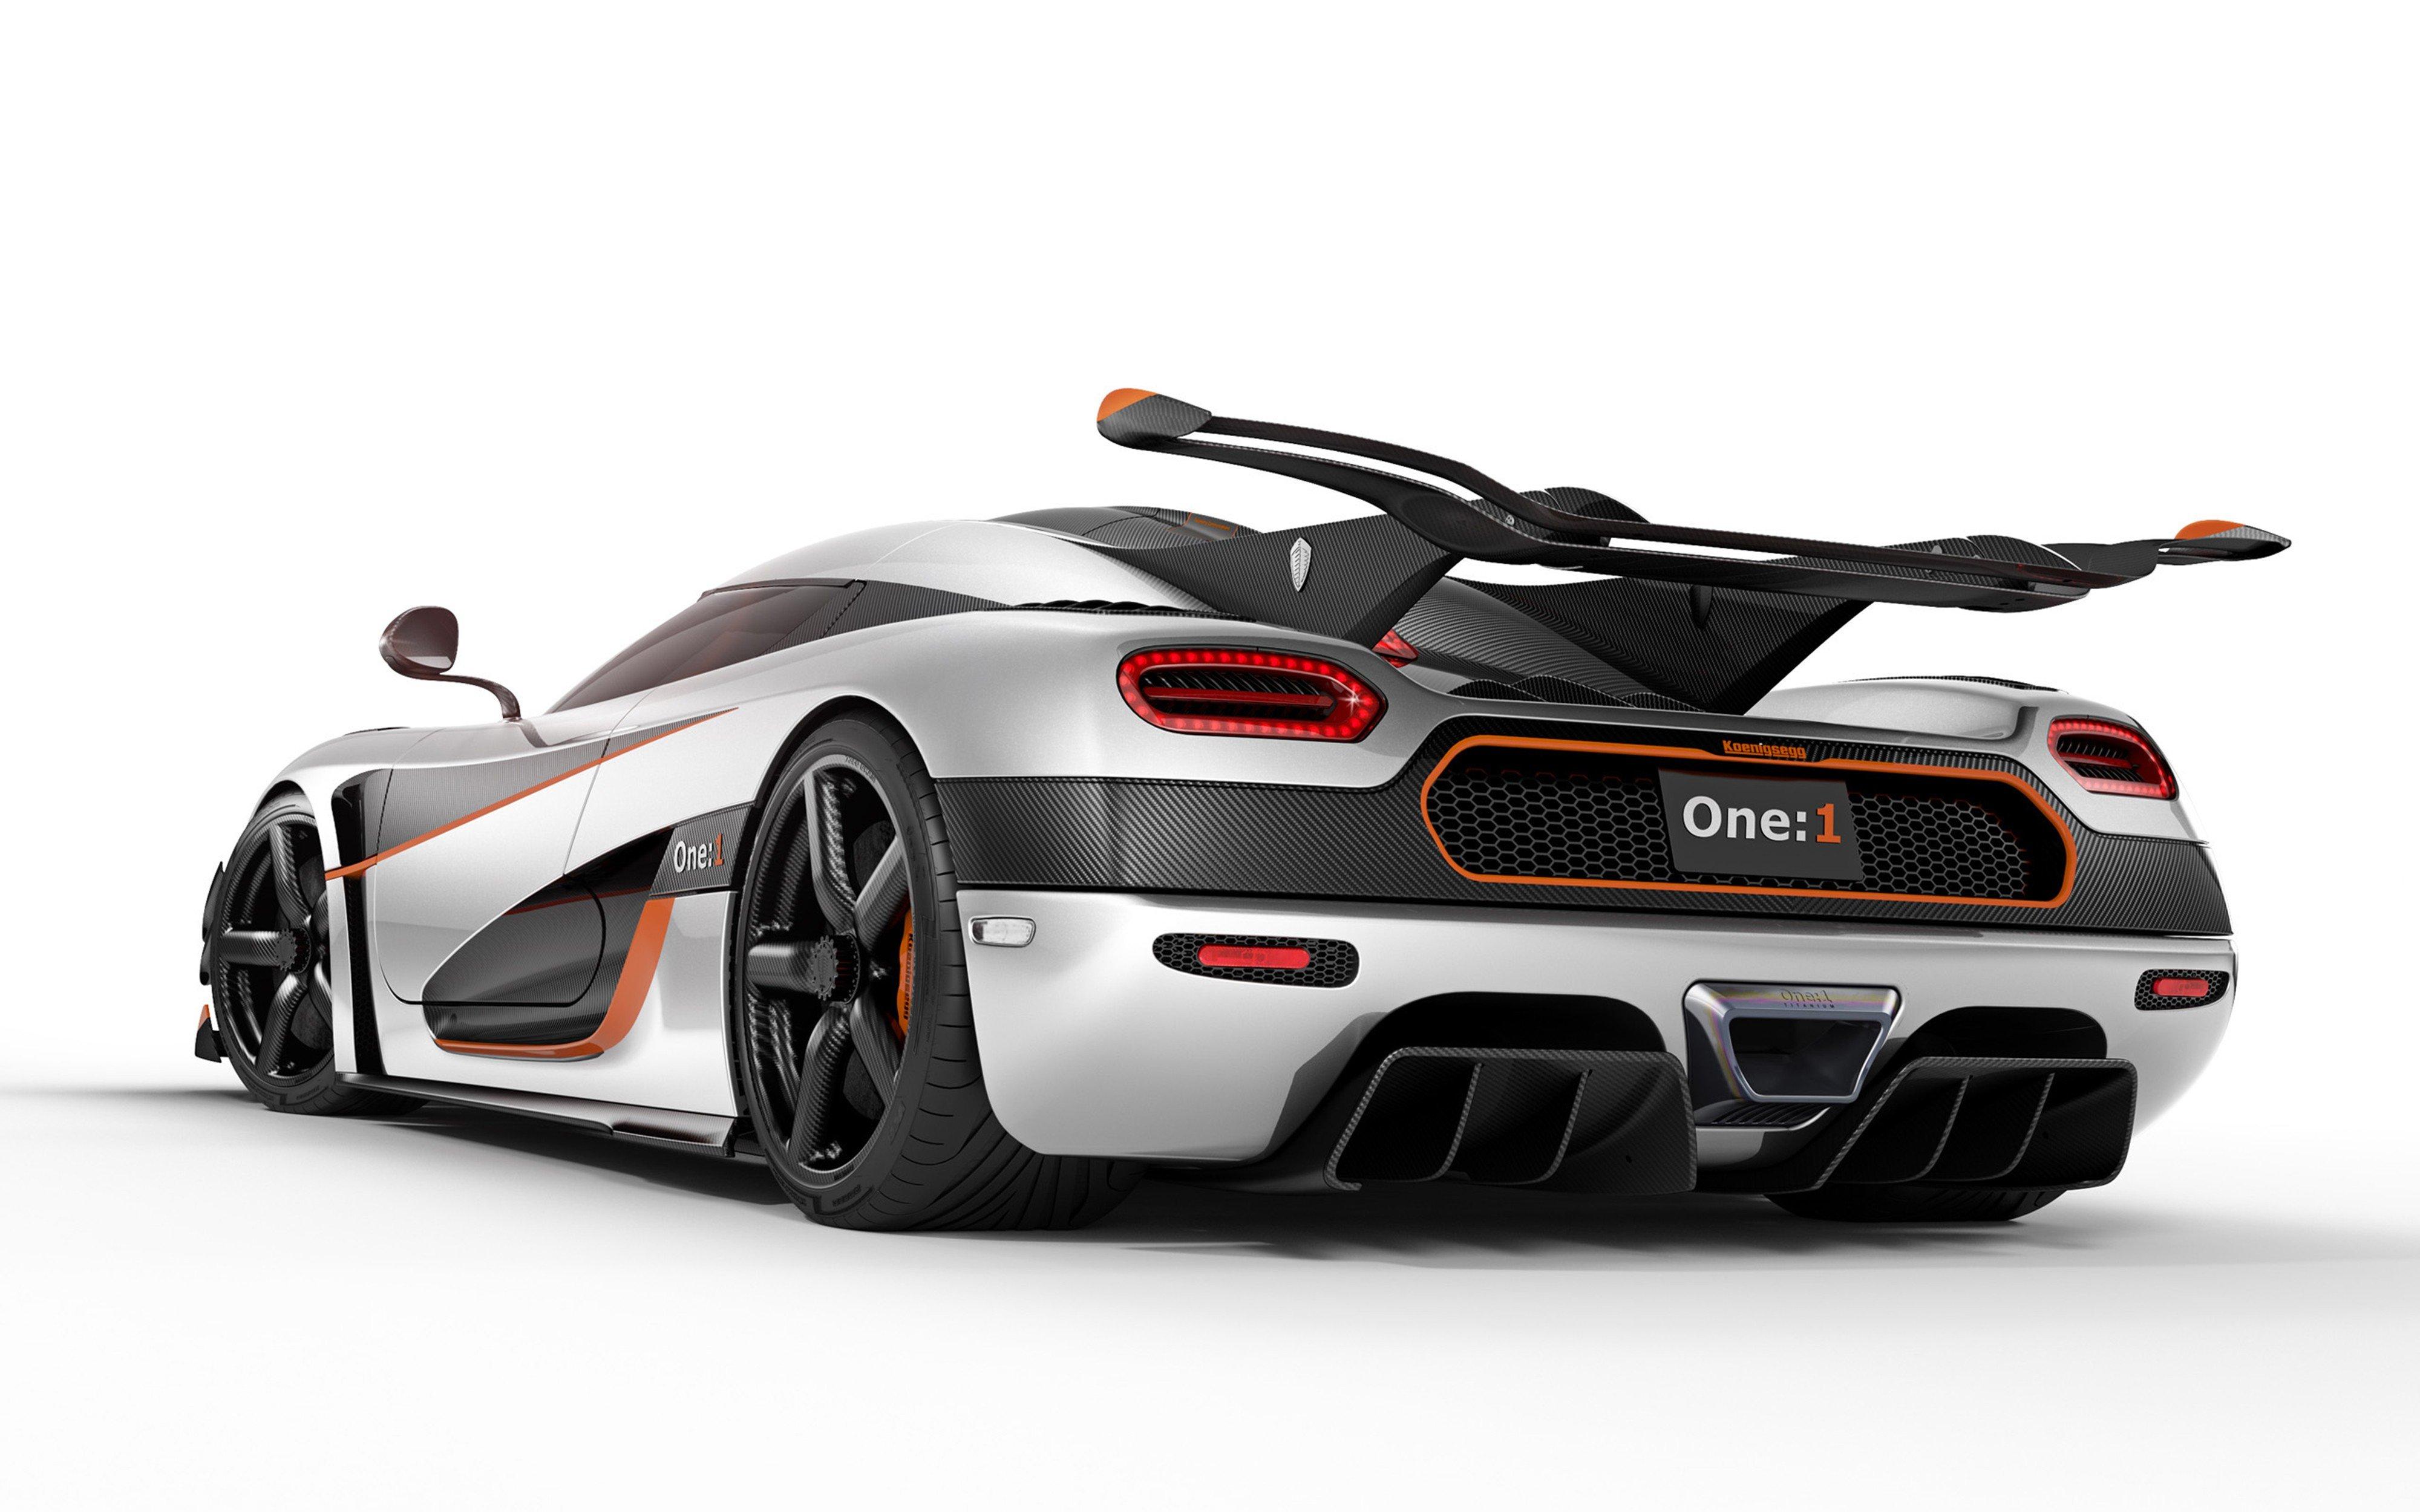 2014 koenigsegg agera one car vehicle sport supercar sportcar